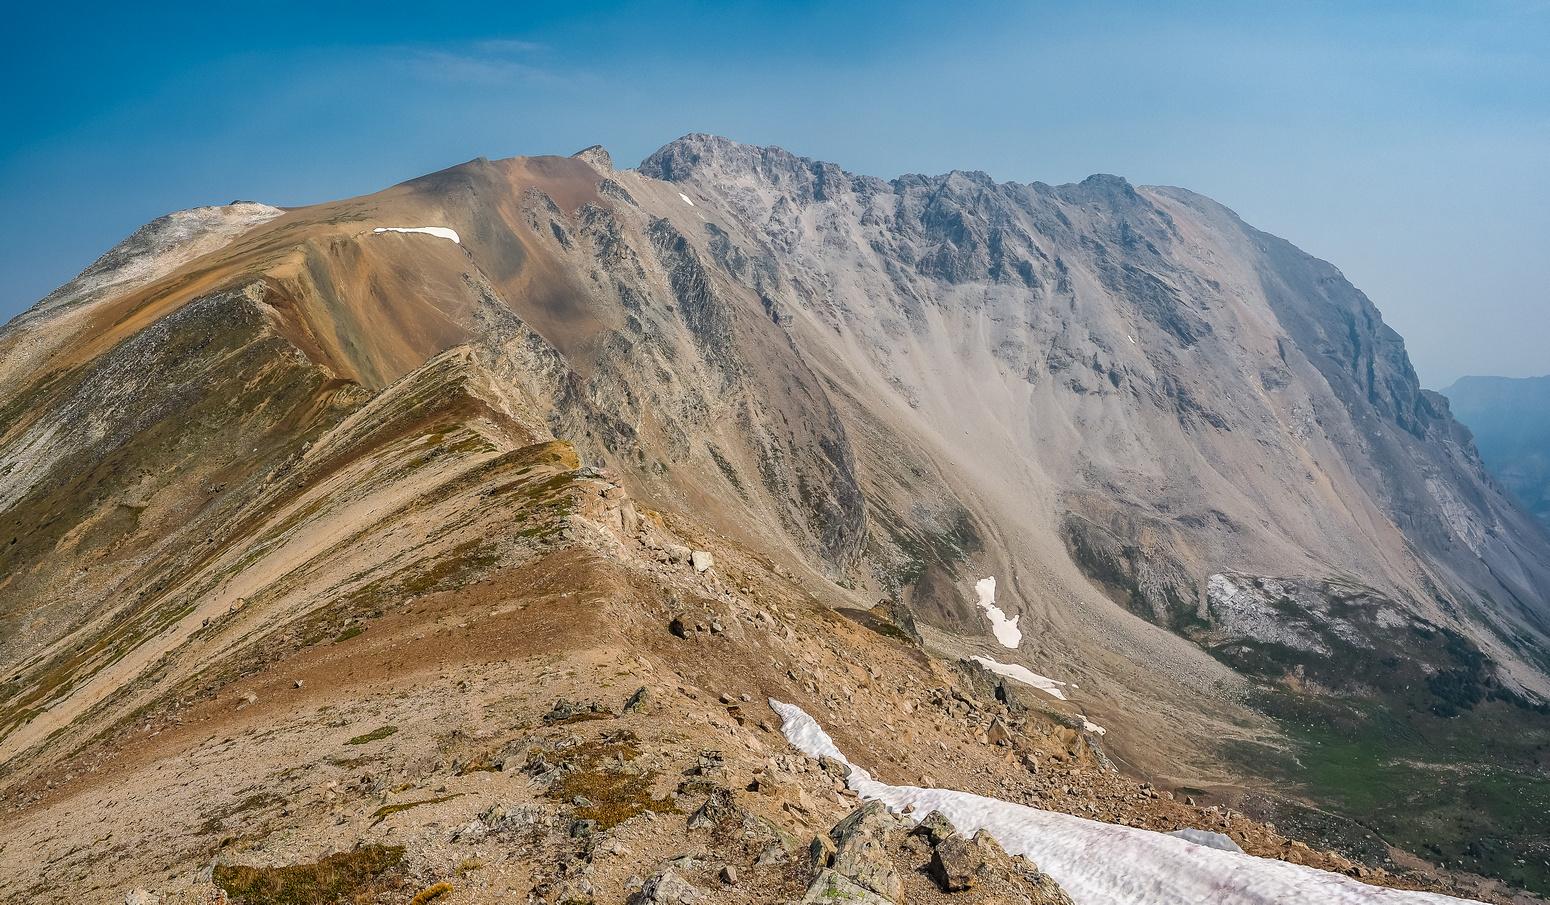 Looking back along the ridge towards Black Brett - I've come a long way already.